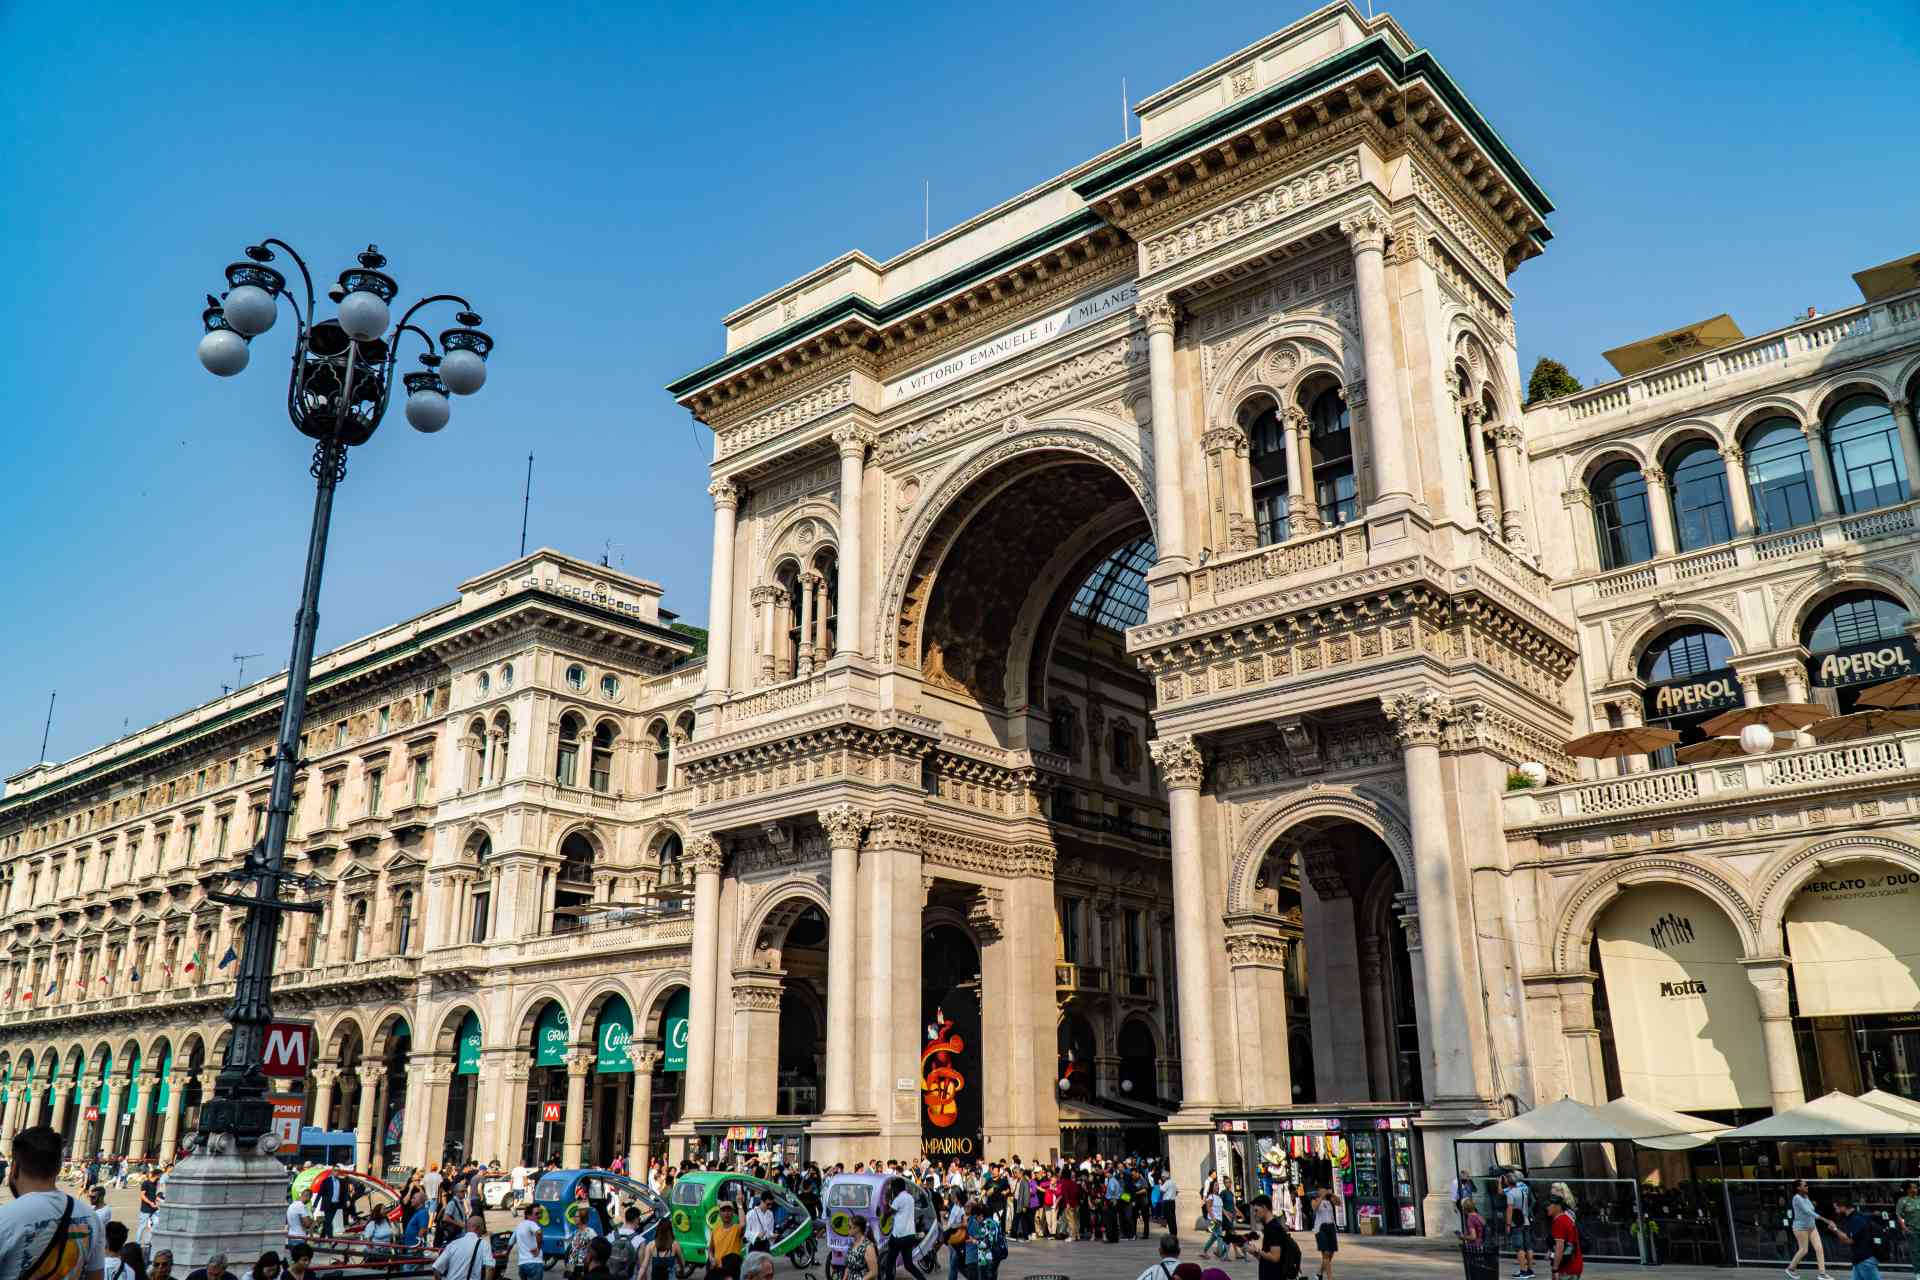 Galleria Vittorio Emanuele II, Italy by Mirza Ariadi